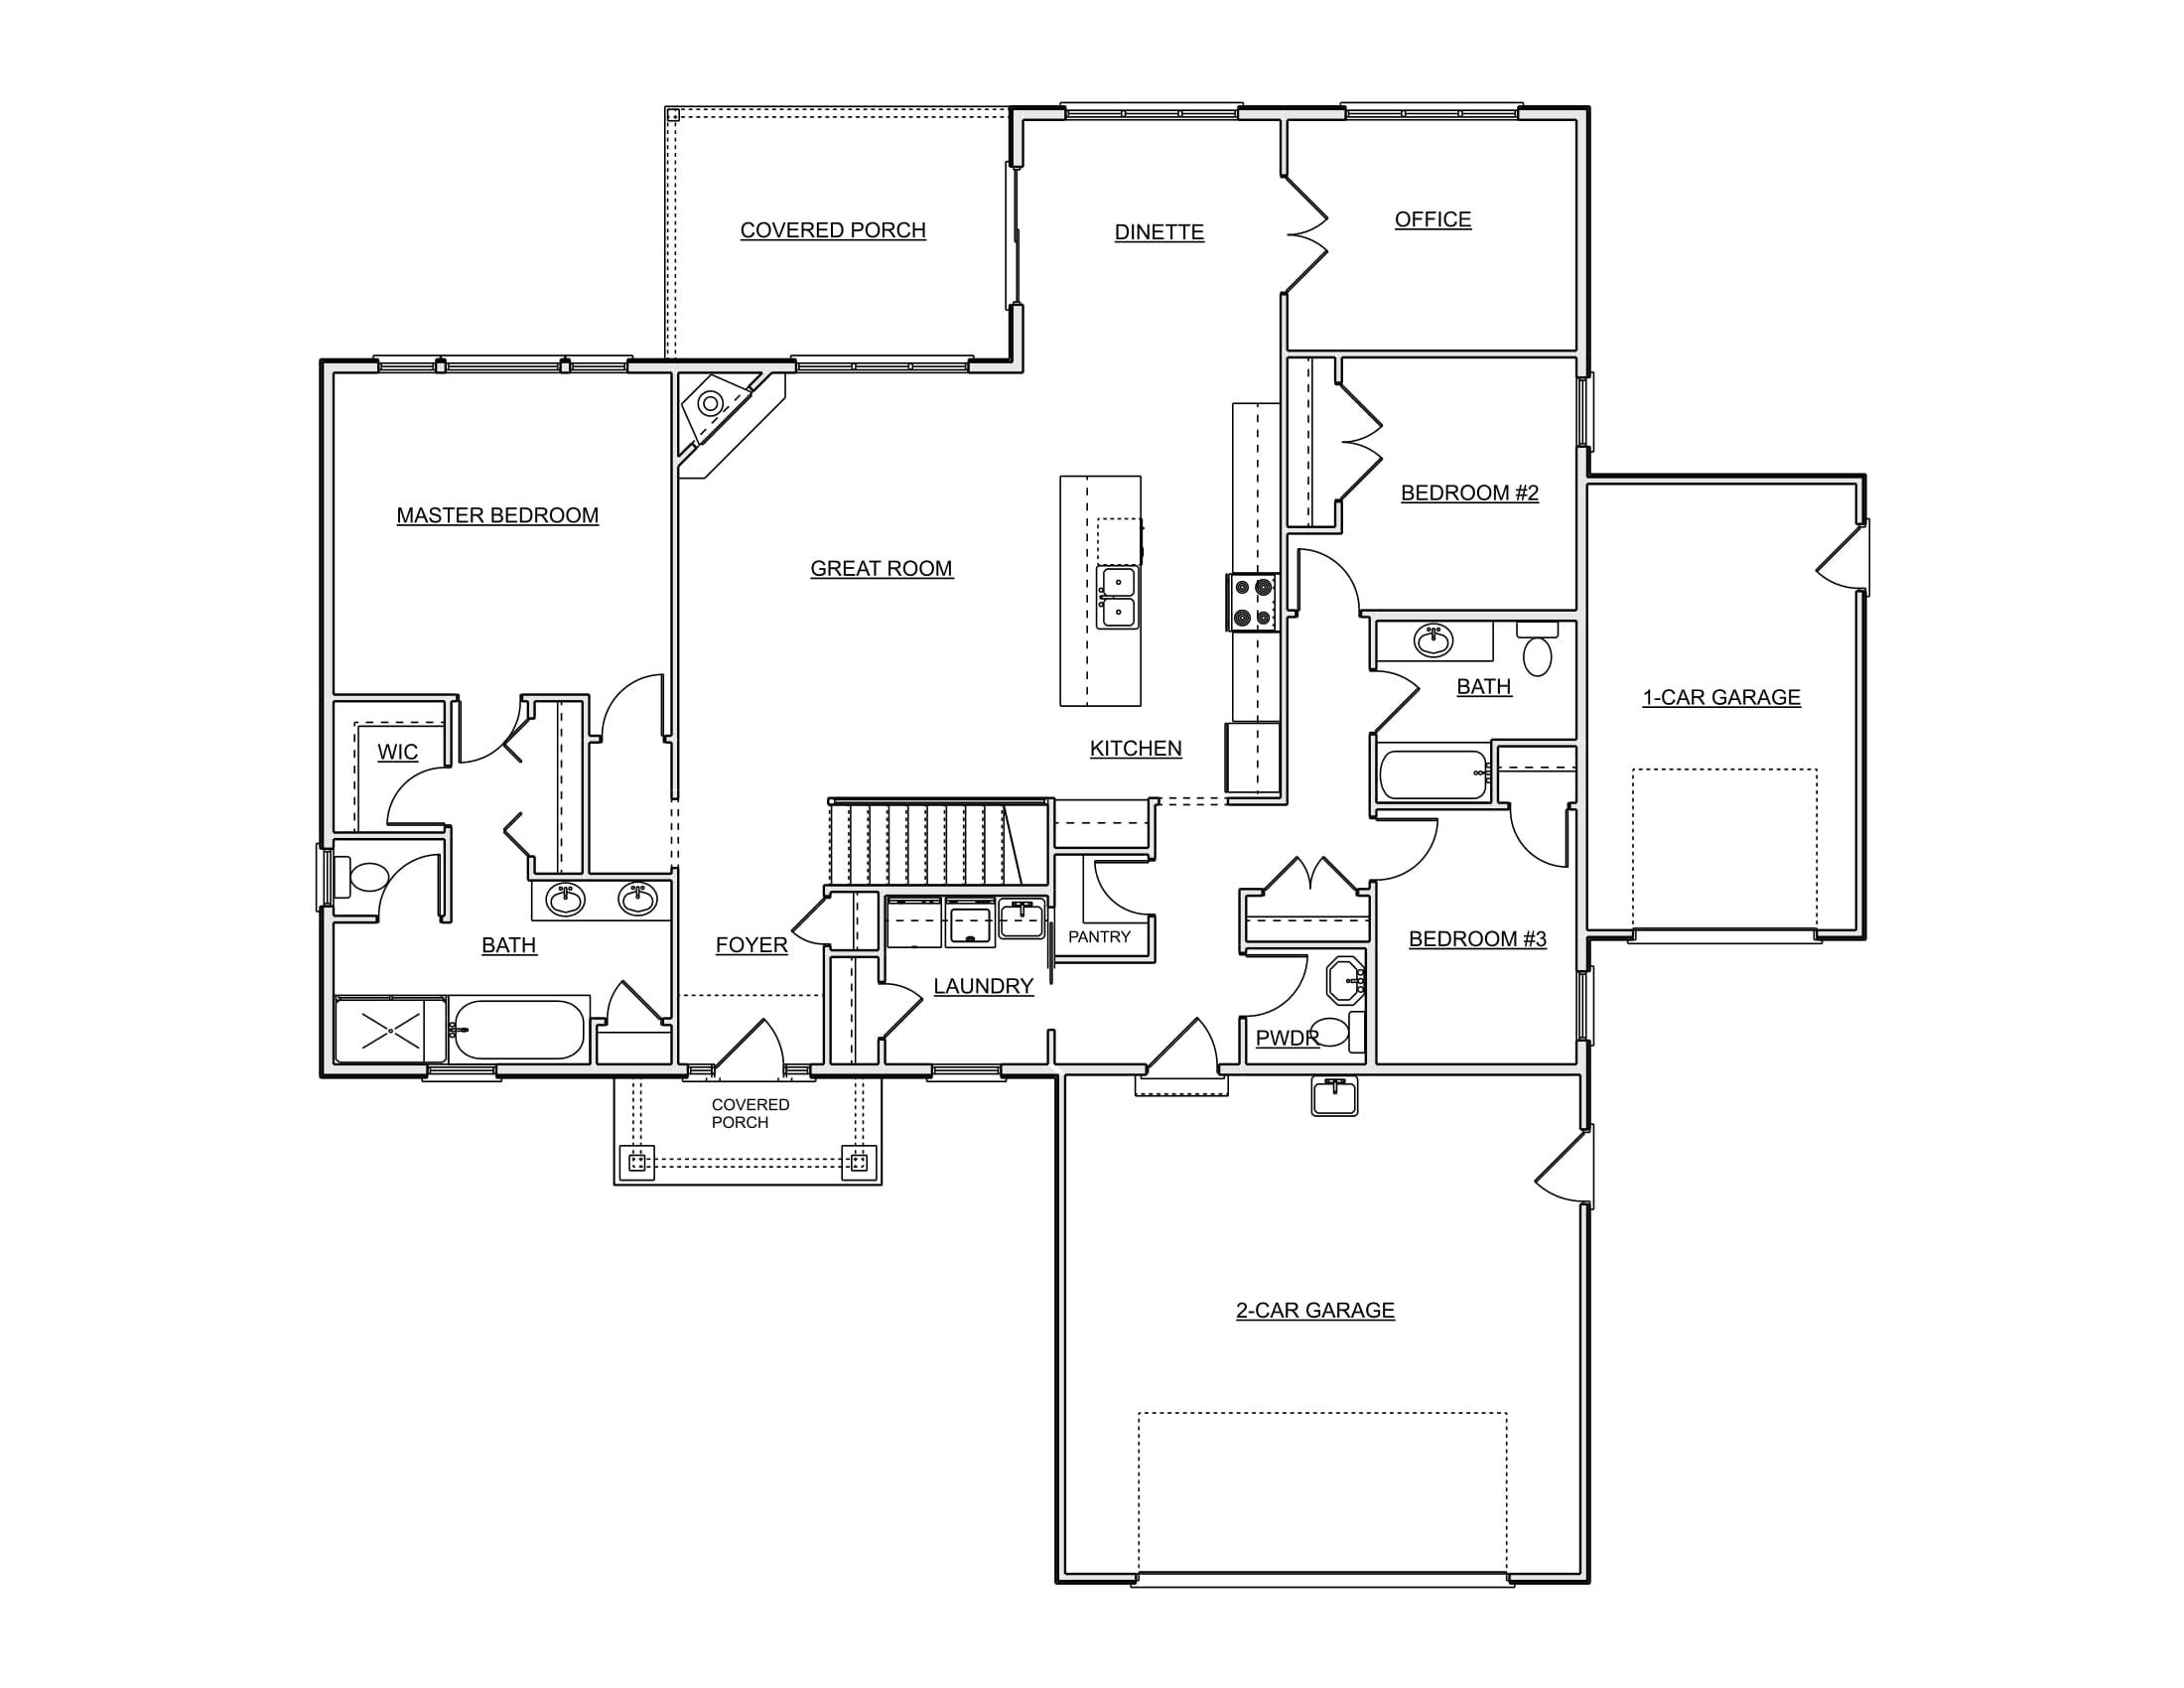 House Plans Haven Creek Homes